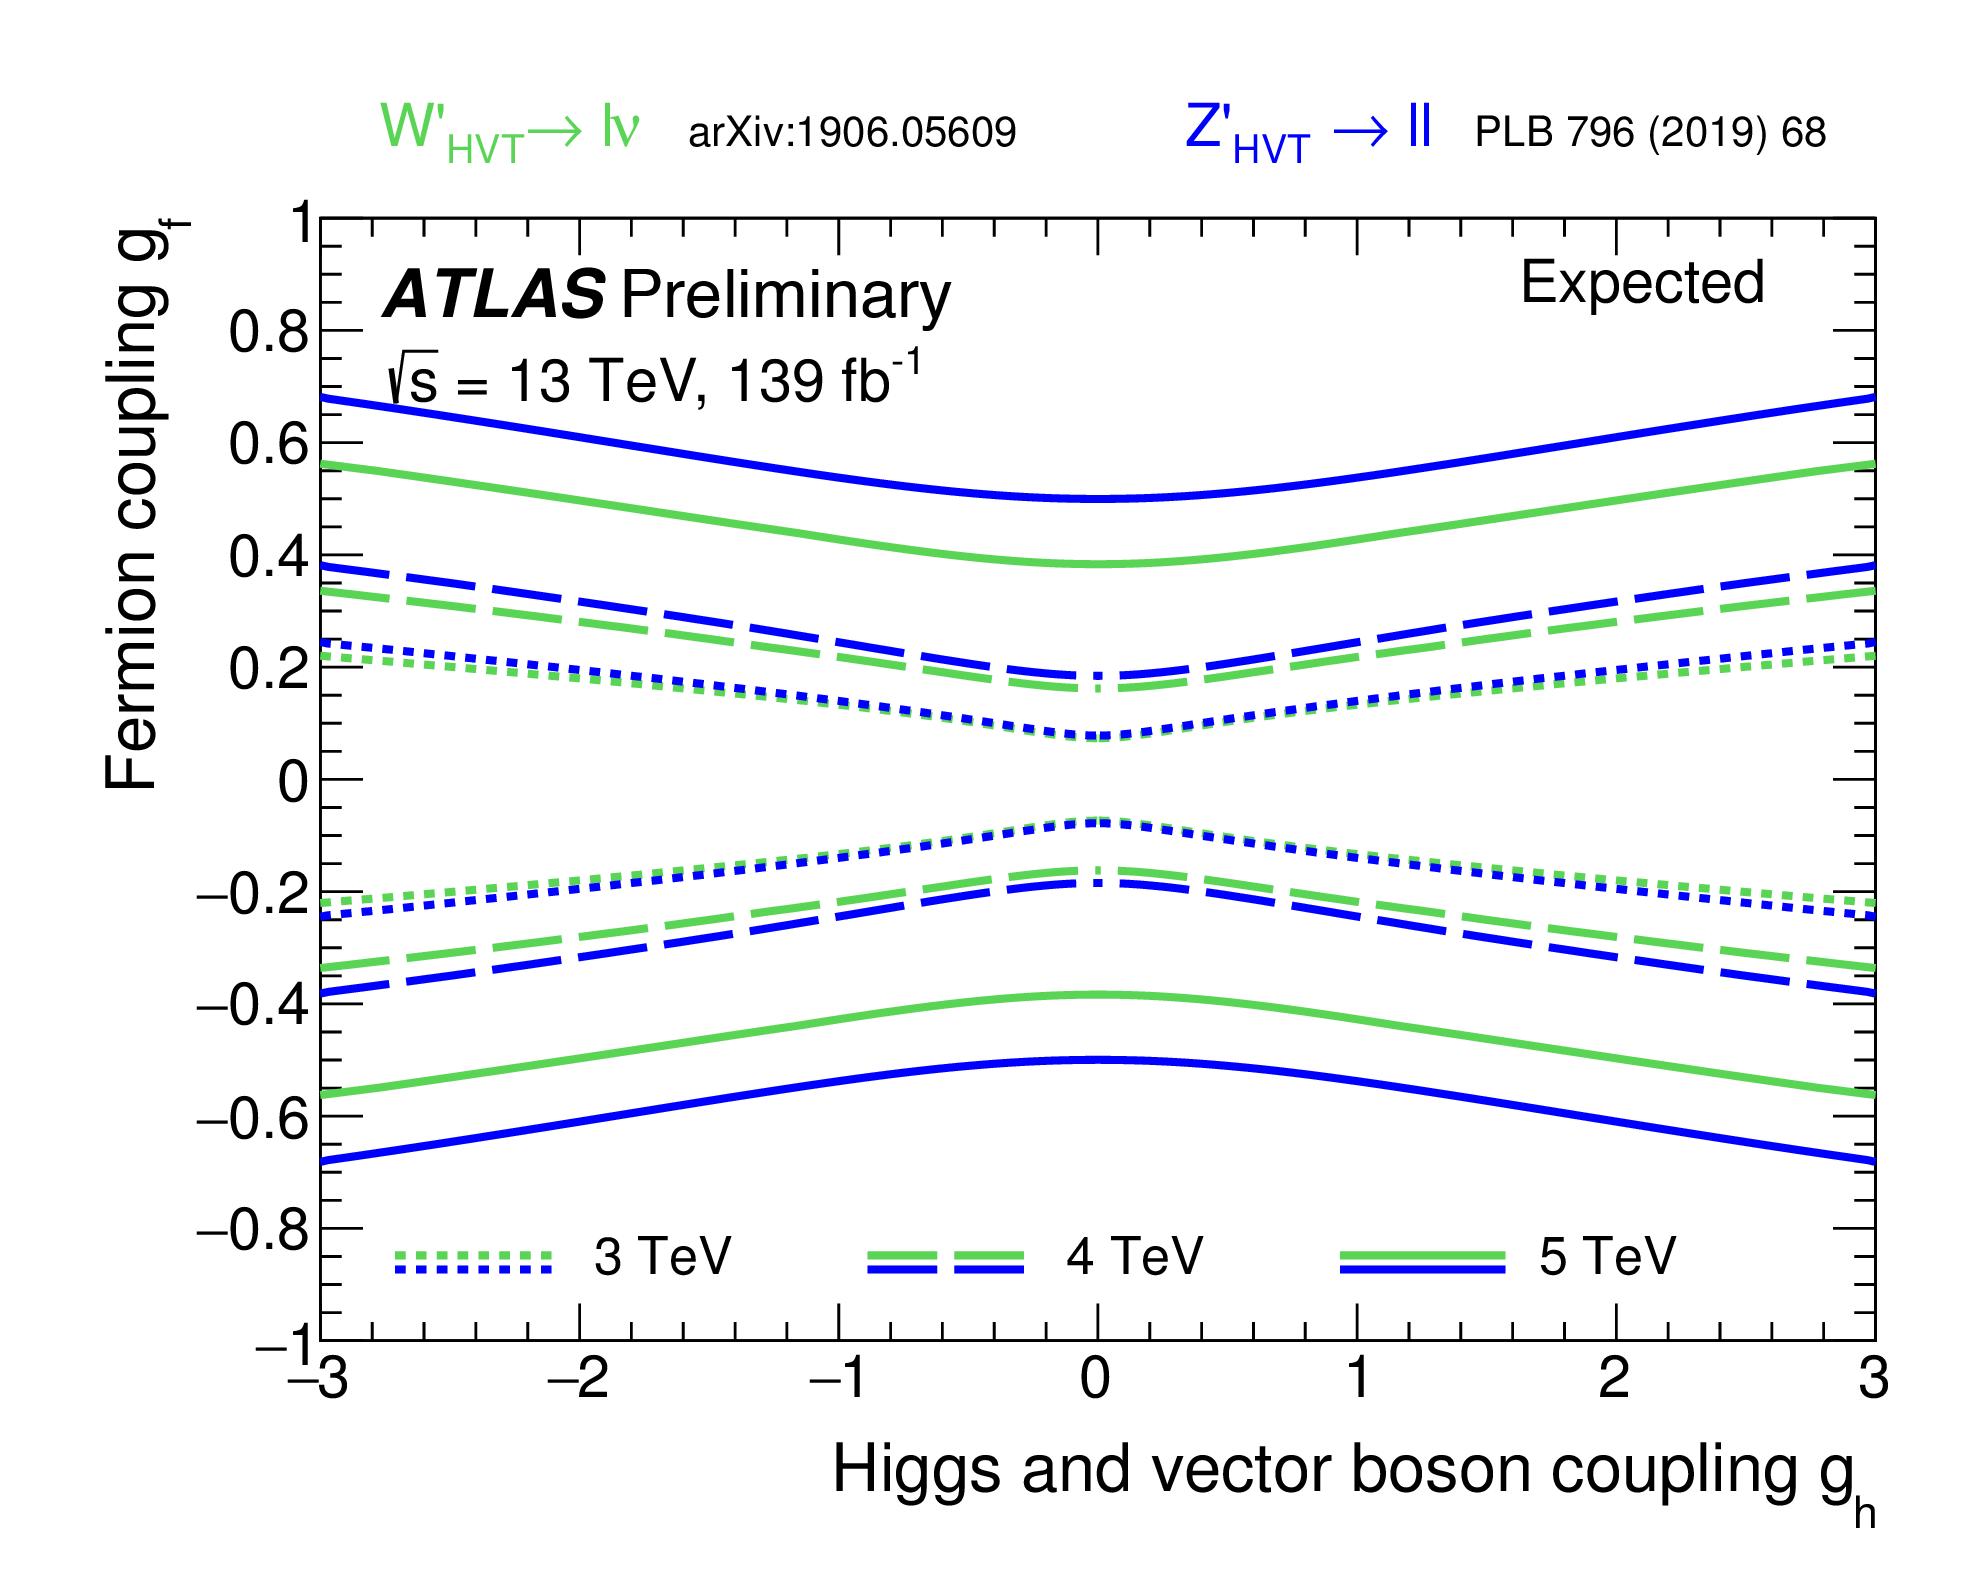 https://atlas.web.cern.ch/Atlas/GROUPS/PHYSICS/CombinedSummaryPlots/EXOTICS/ATLAS_HVT_Lepton_Summary_gf_gh_exp/ATLAS_HVT_Lepton_Summary_gf_gh_exp.png